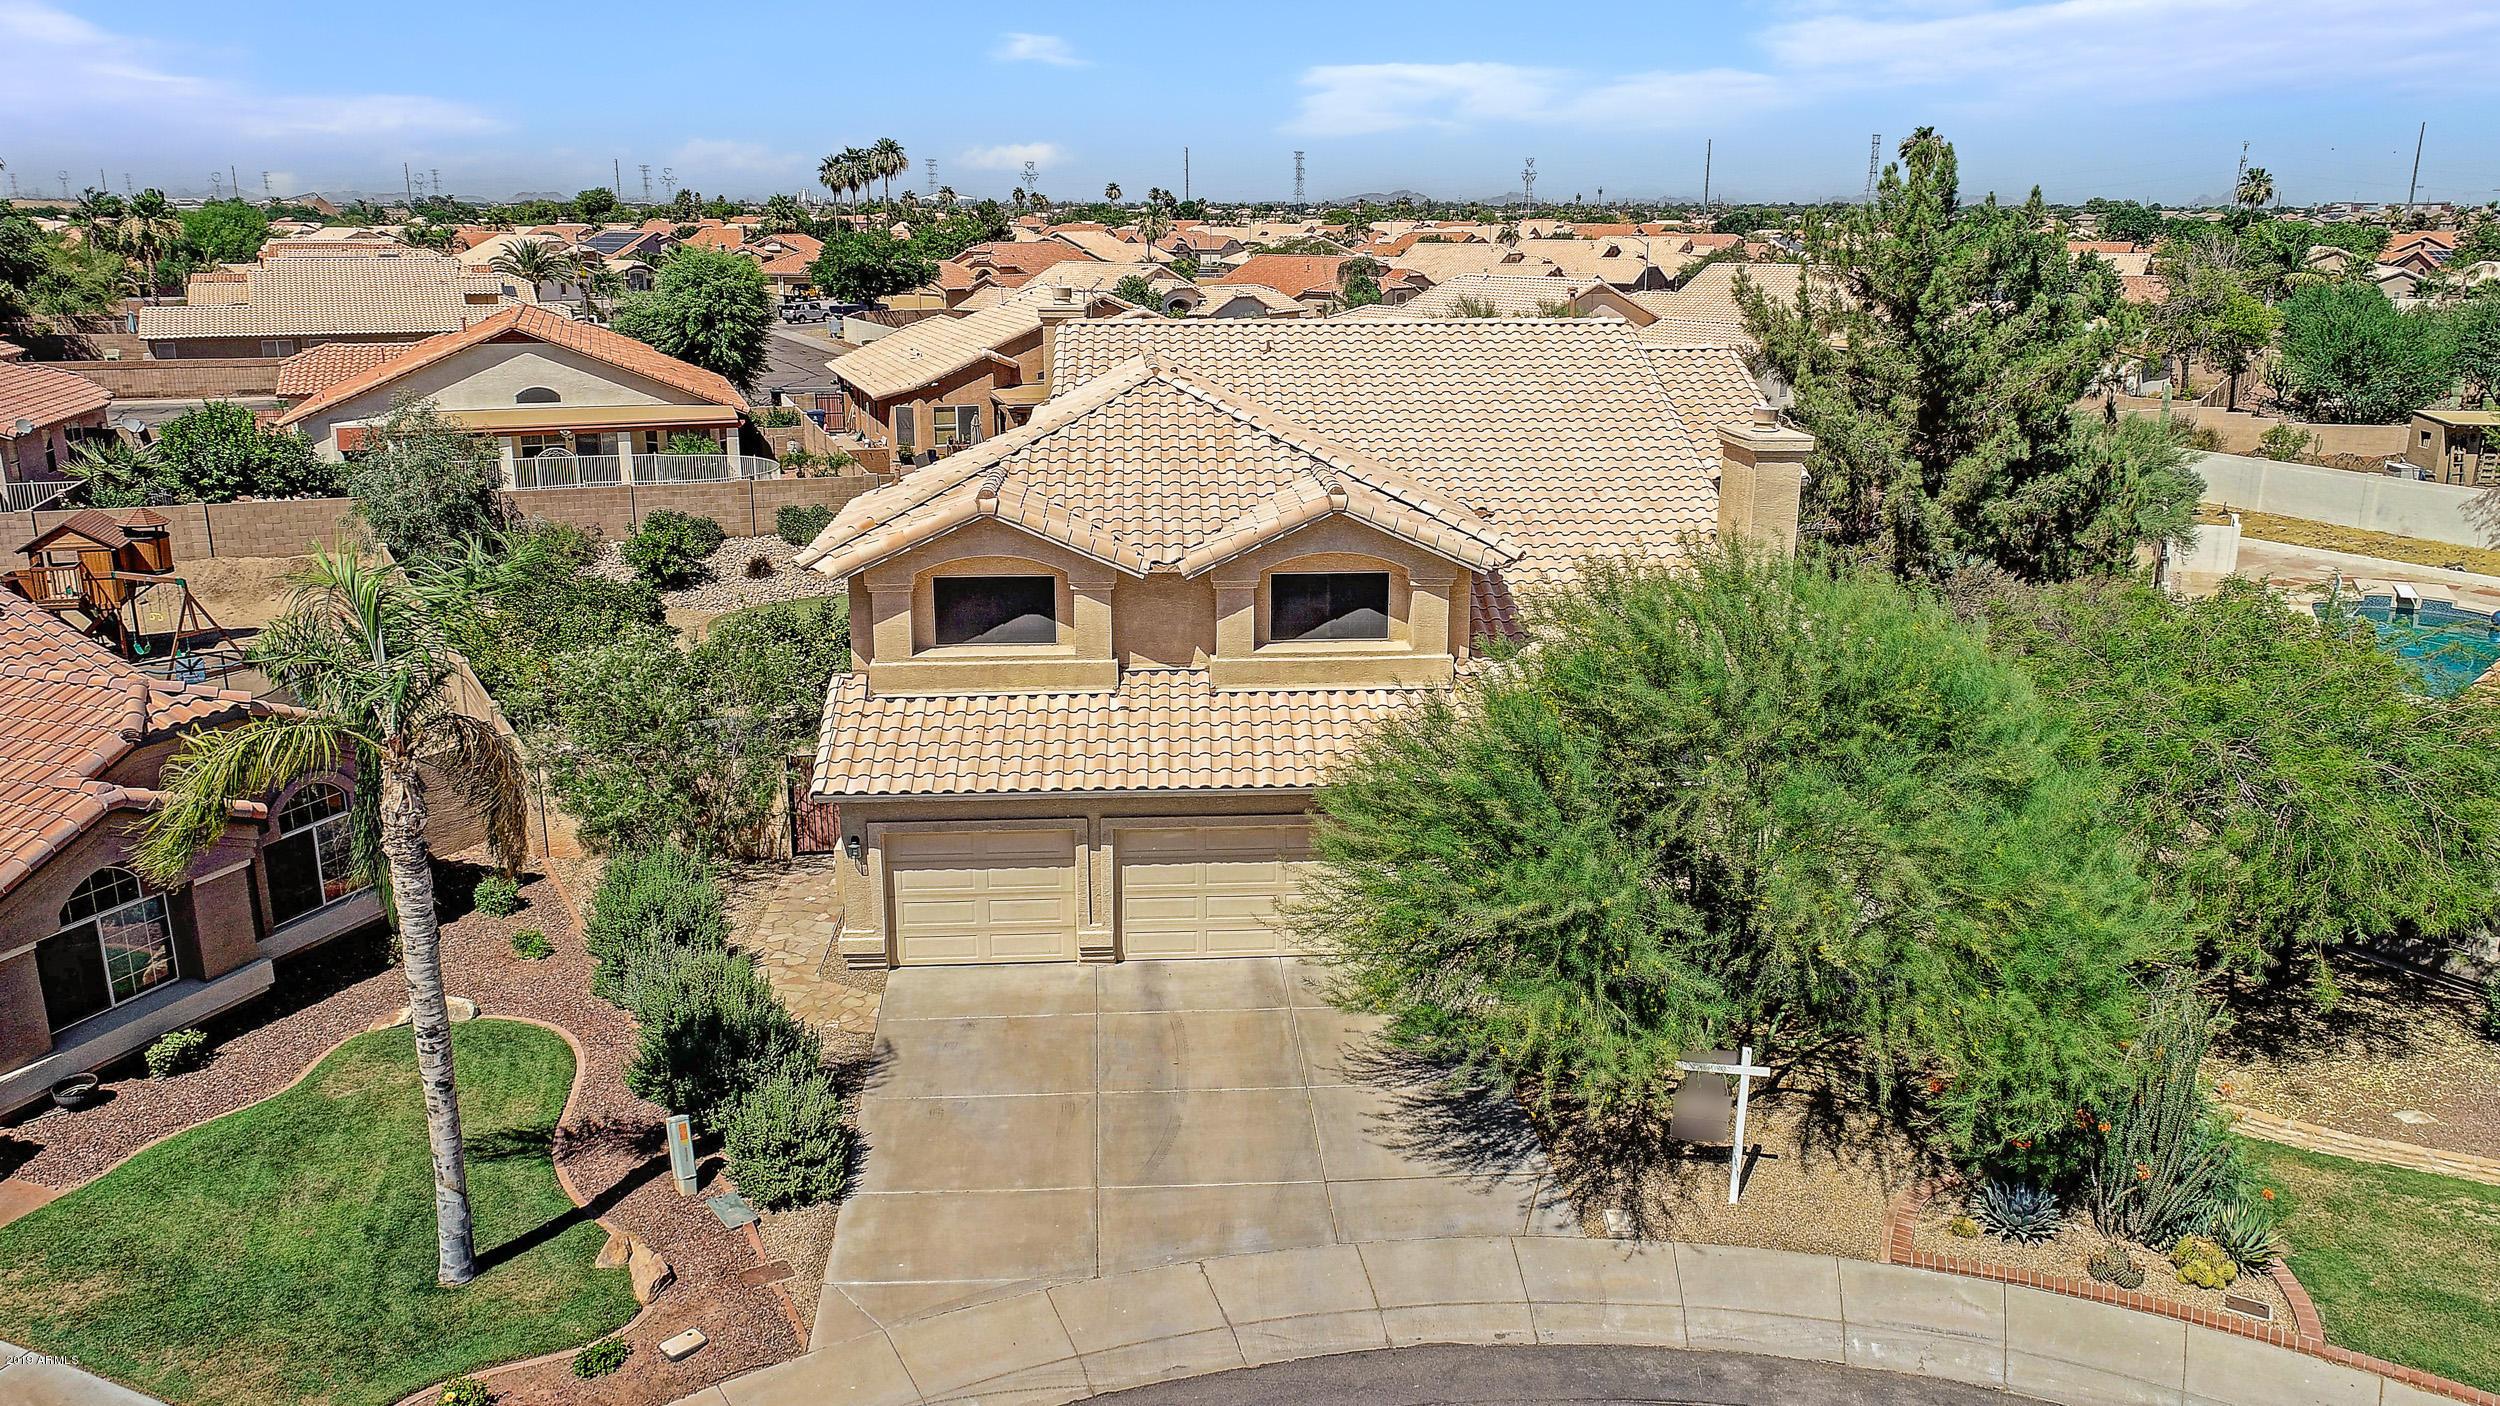 Photo of 2133 N 125TH Avenue, Avondale, AZ 85392